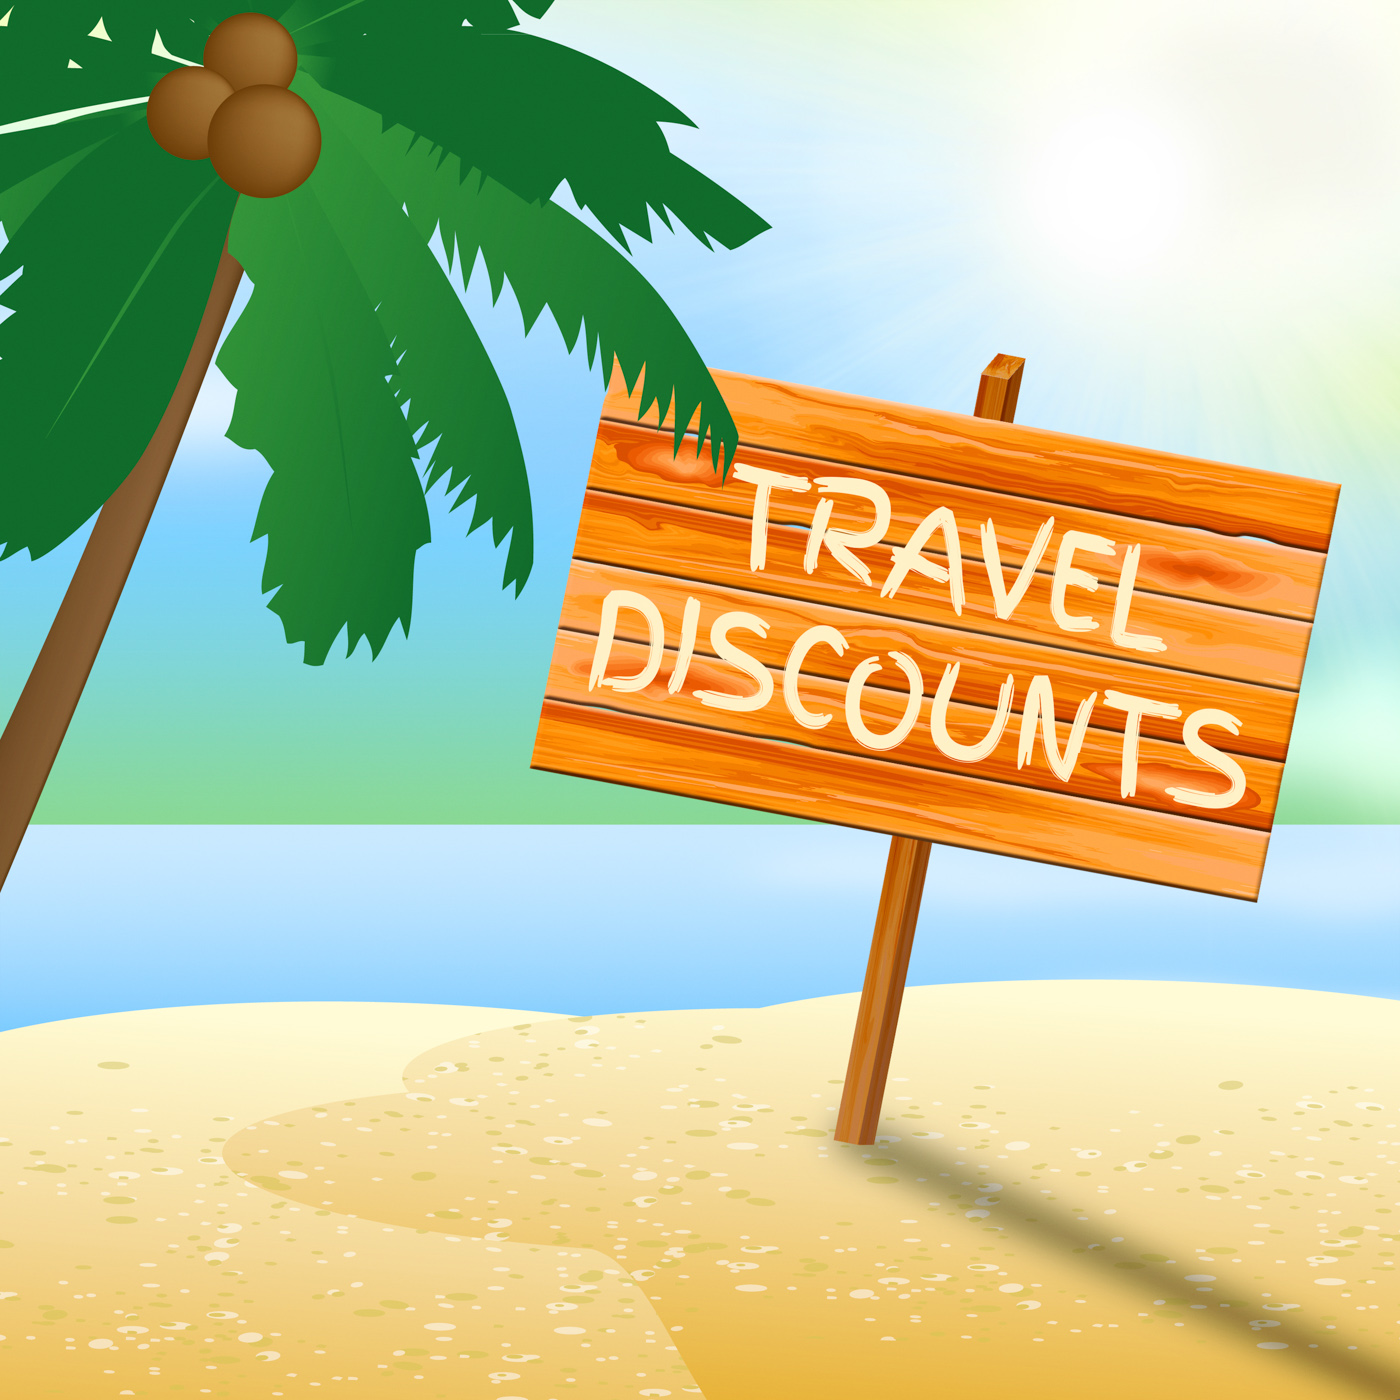 Travel discounts means promo trip 3d illustration photo